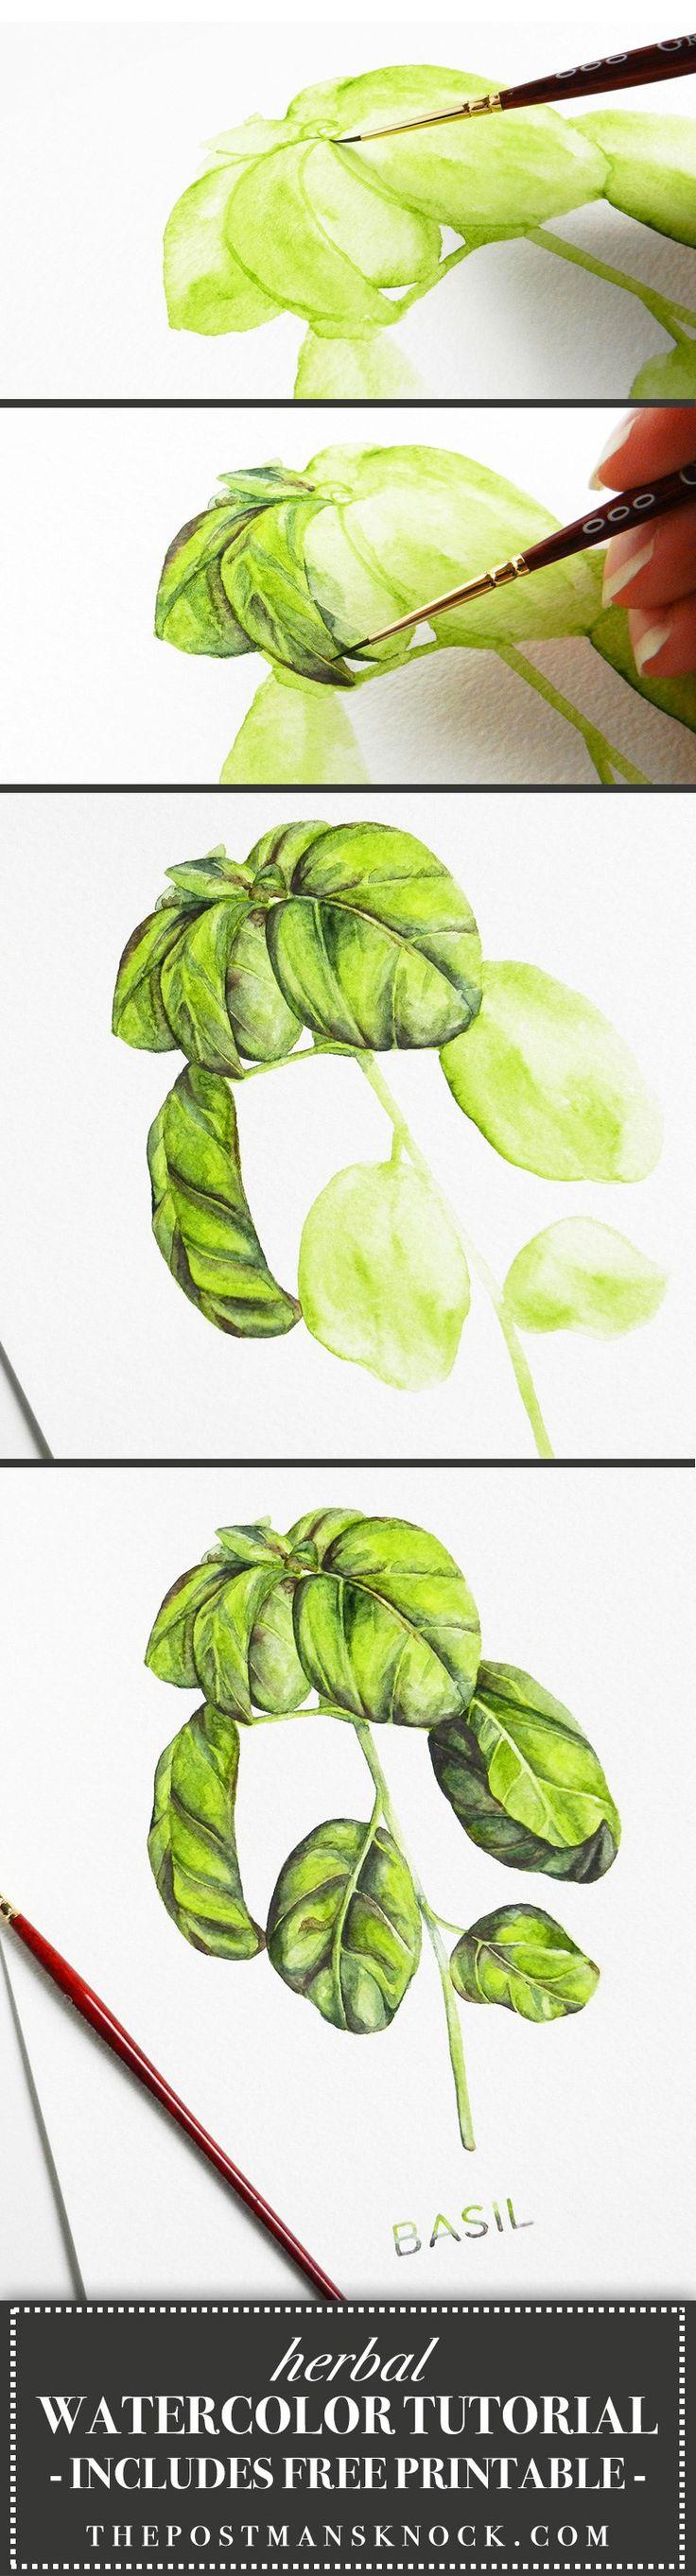 Herbal Watercolor Tutorial | The Postman's Knock